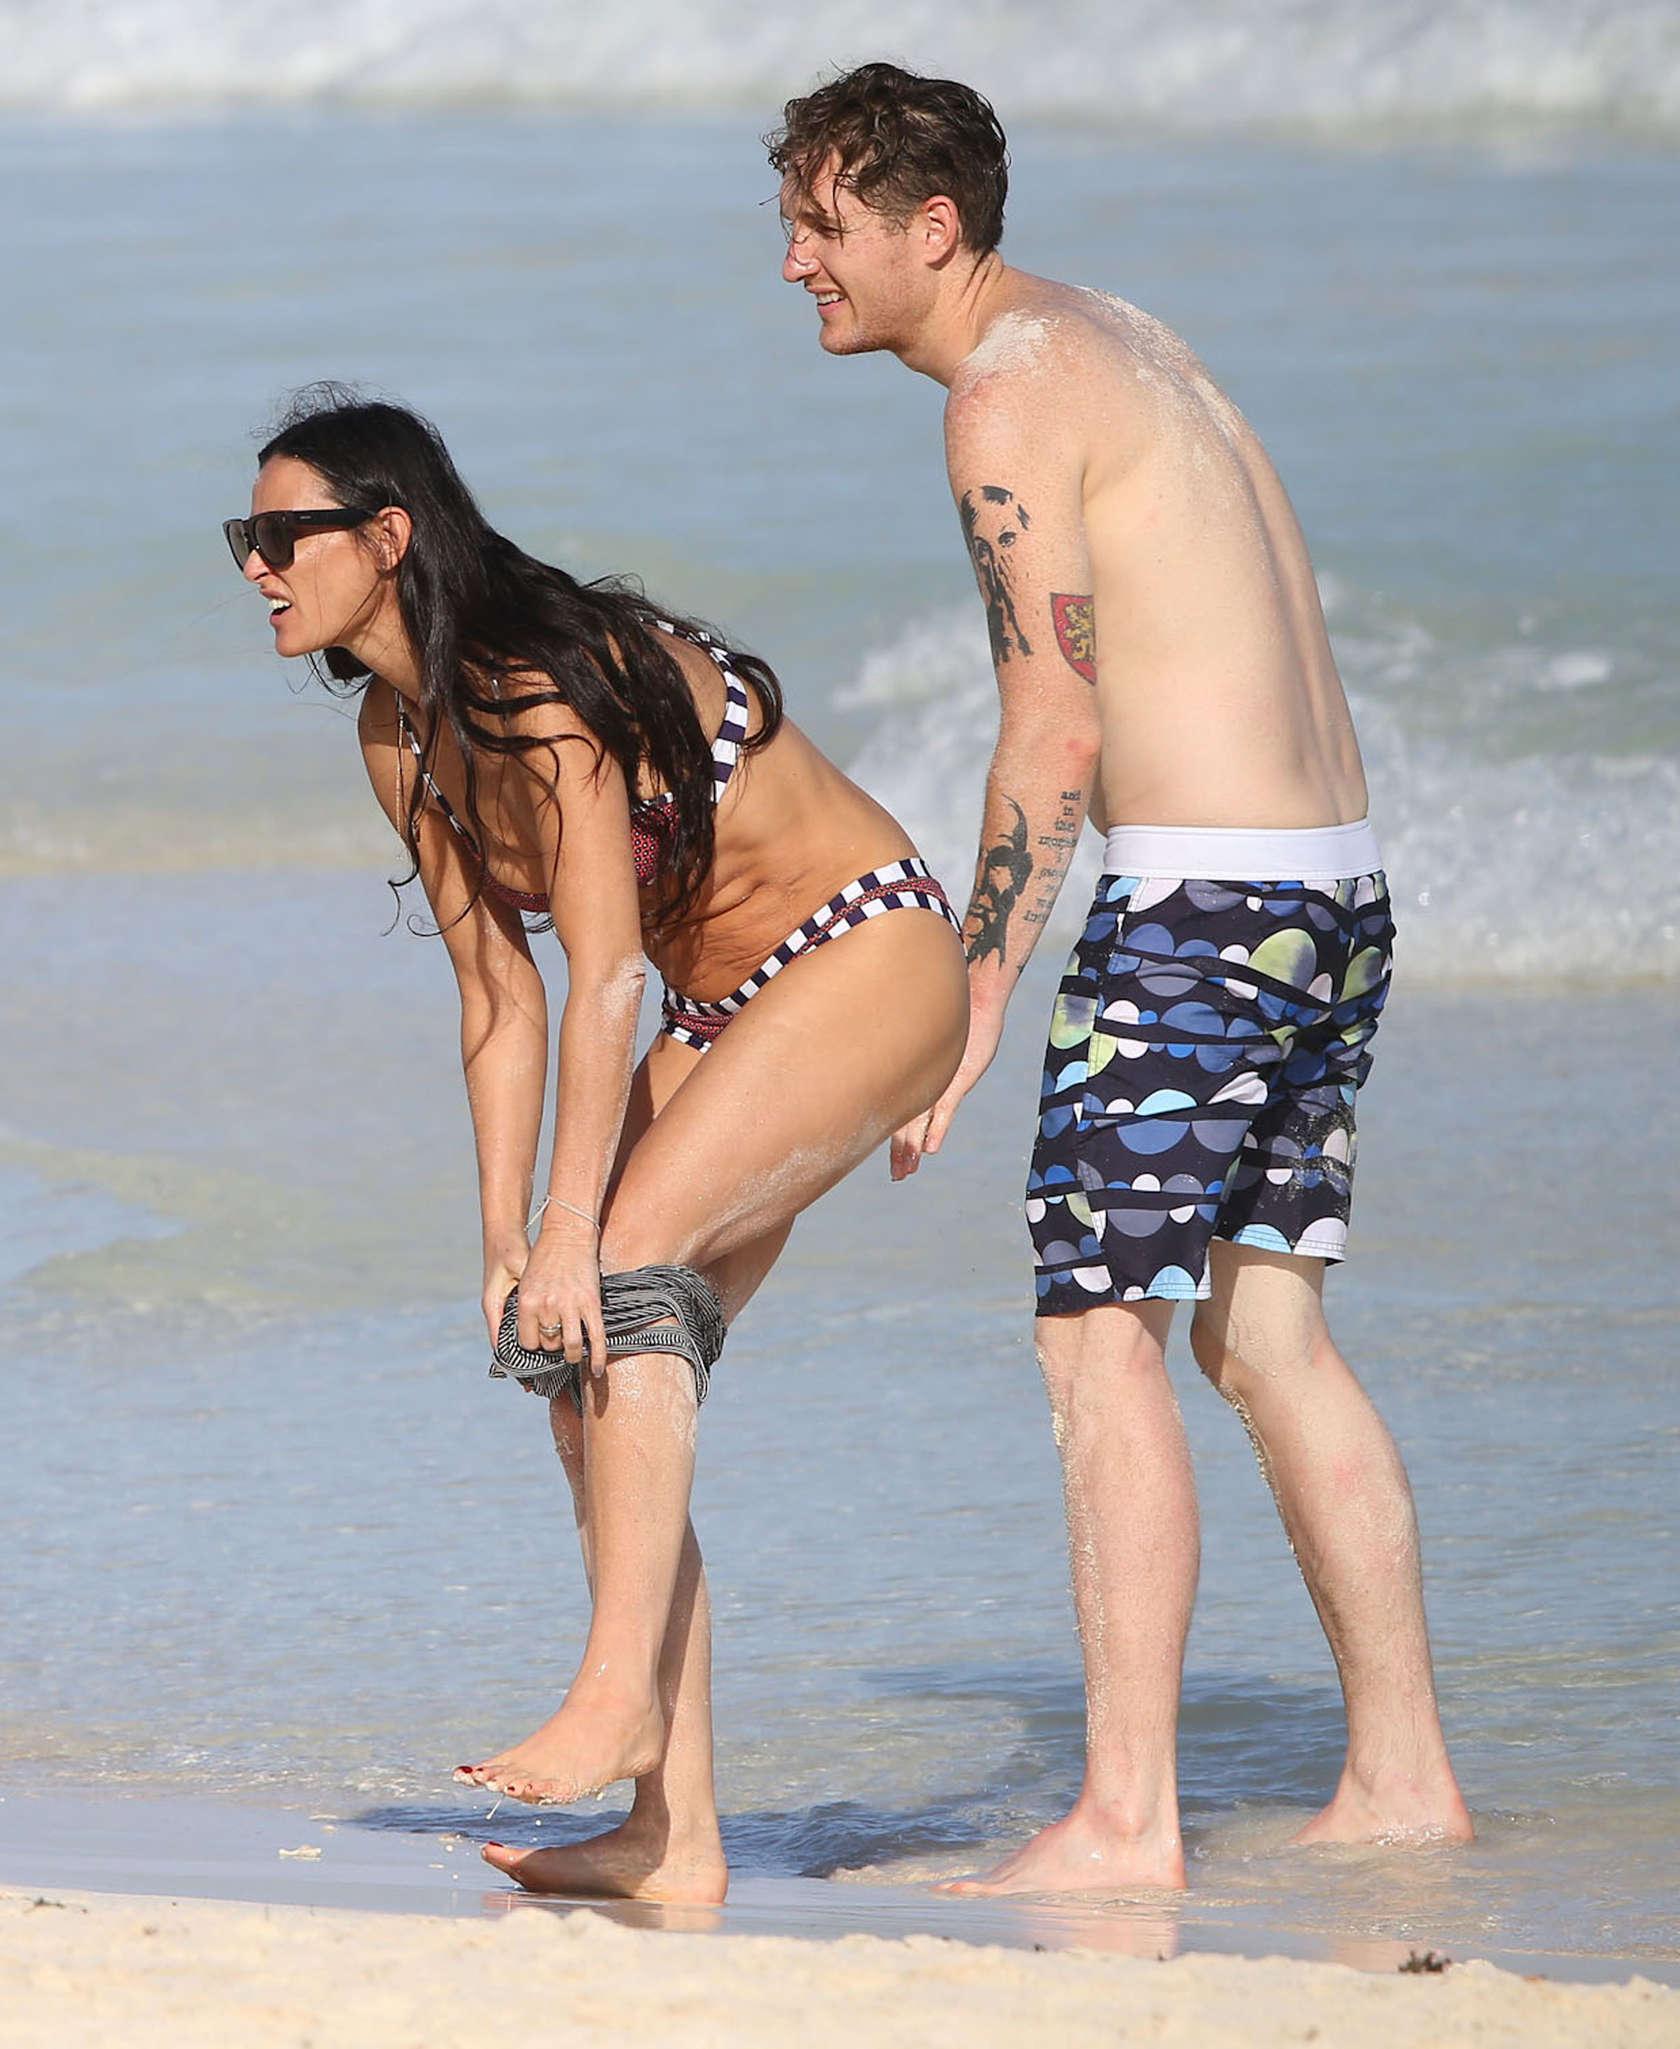 Demi moore bikini photos